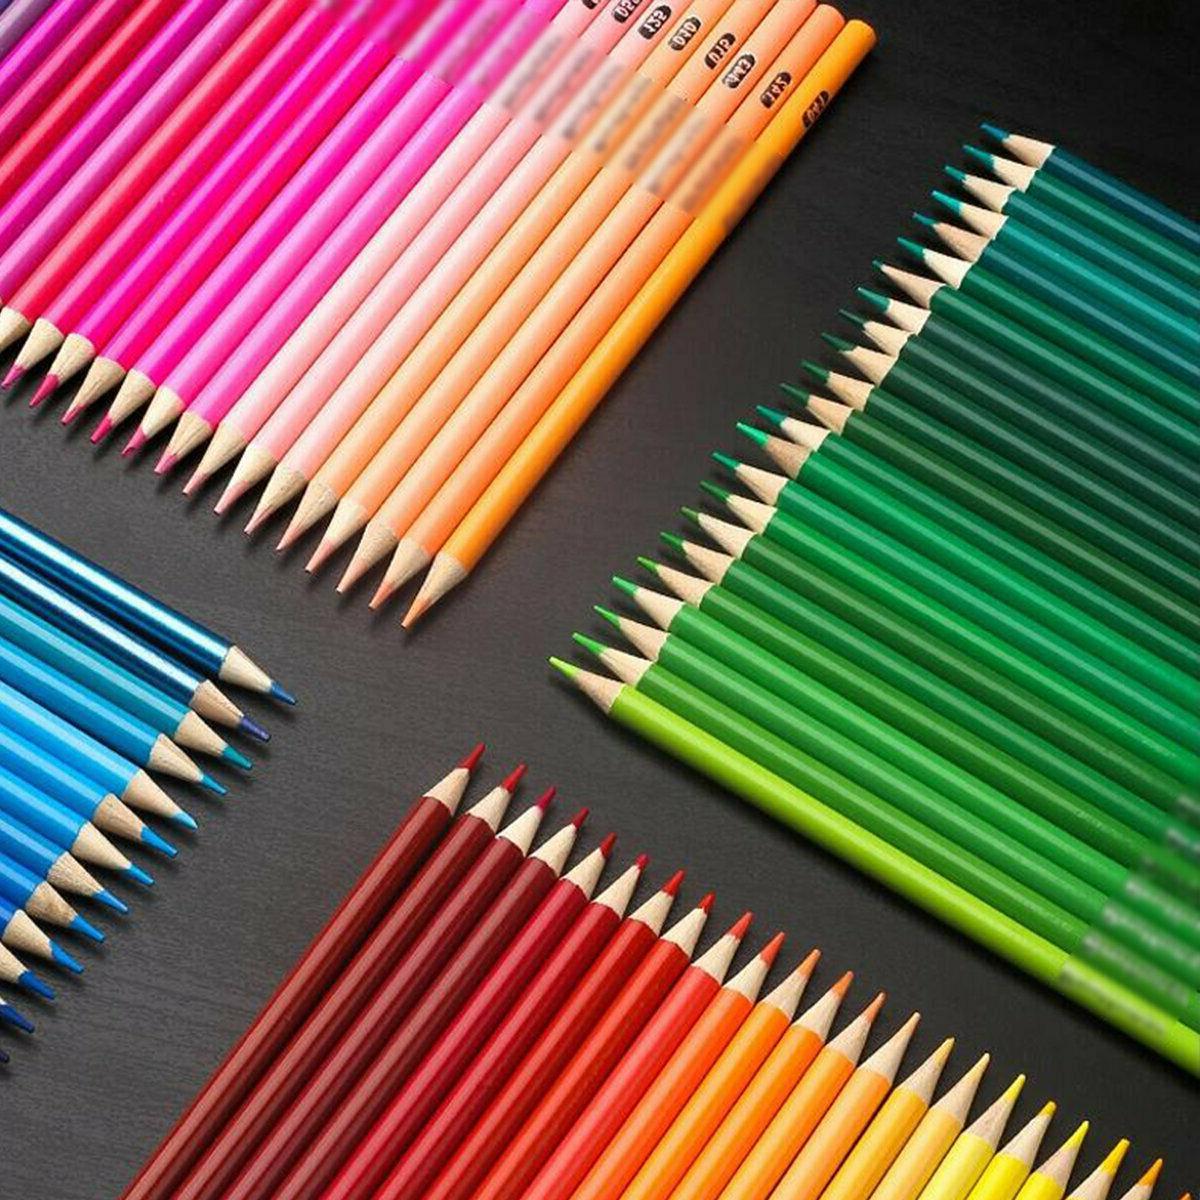 Professional Set Artist Wood Pencil